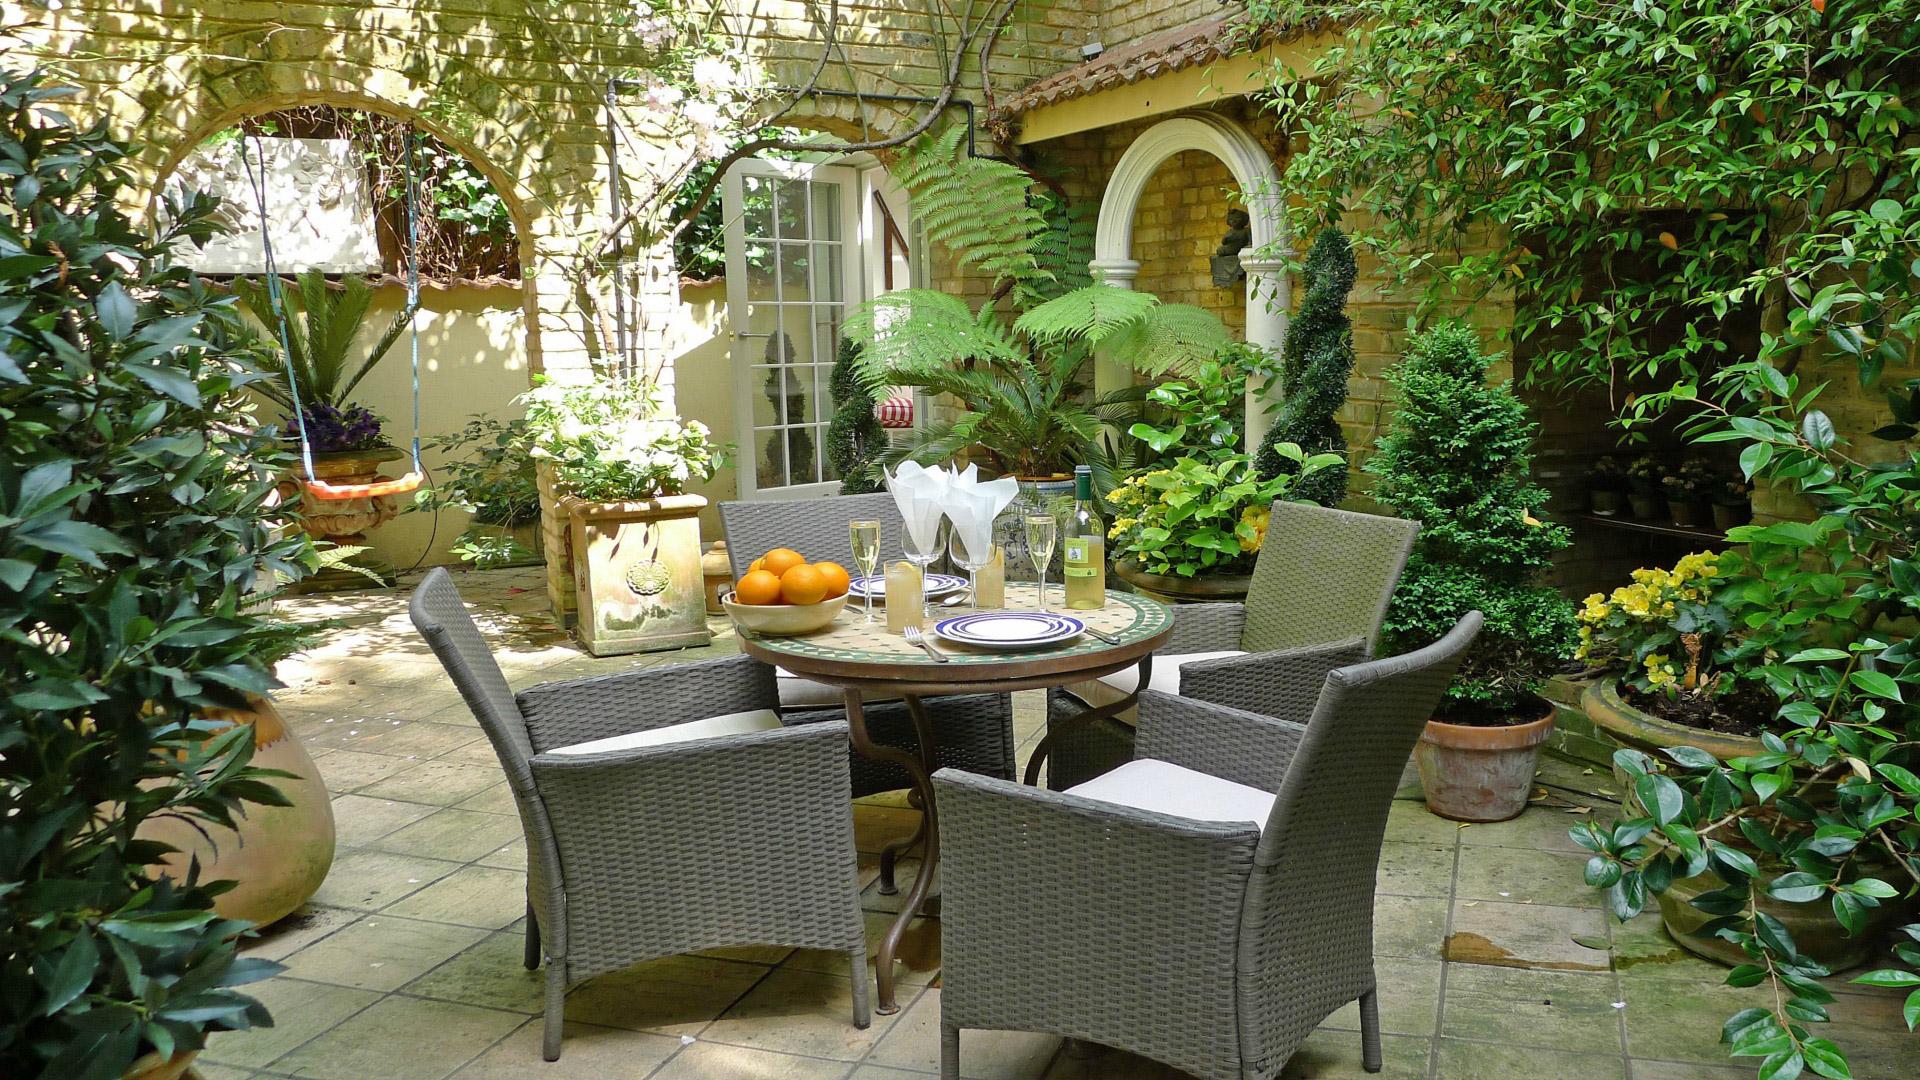 Kensington Vacation Apartment with Patio Garden